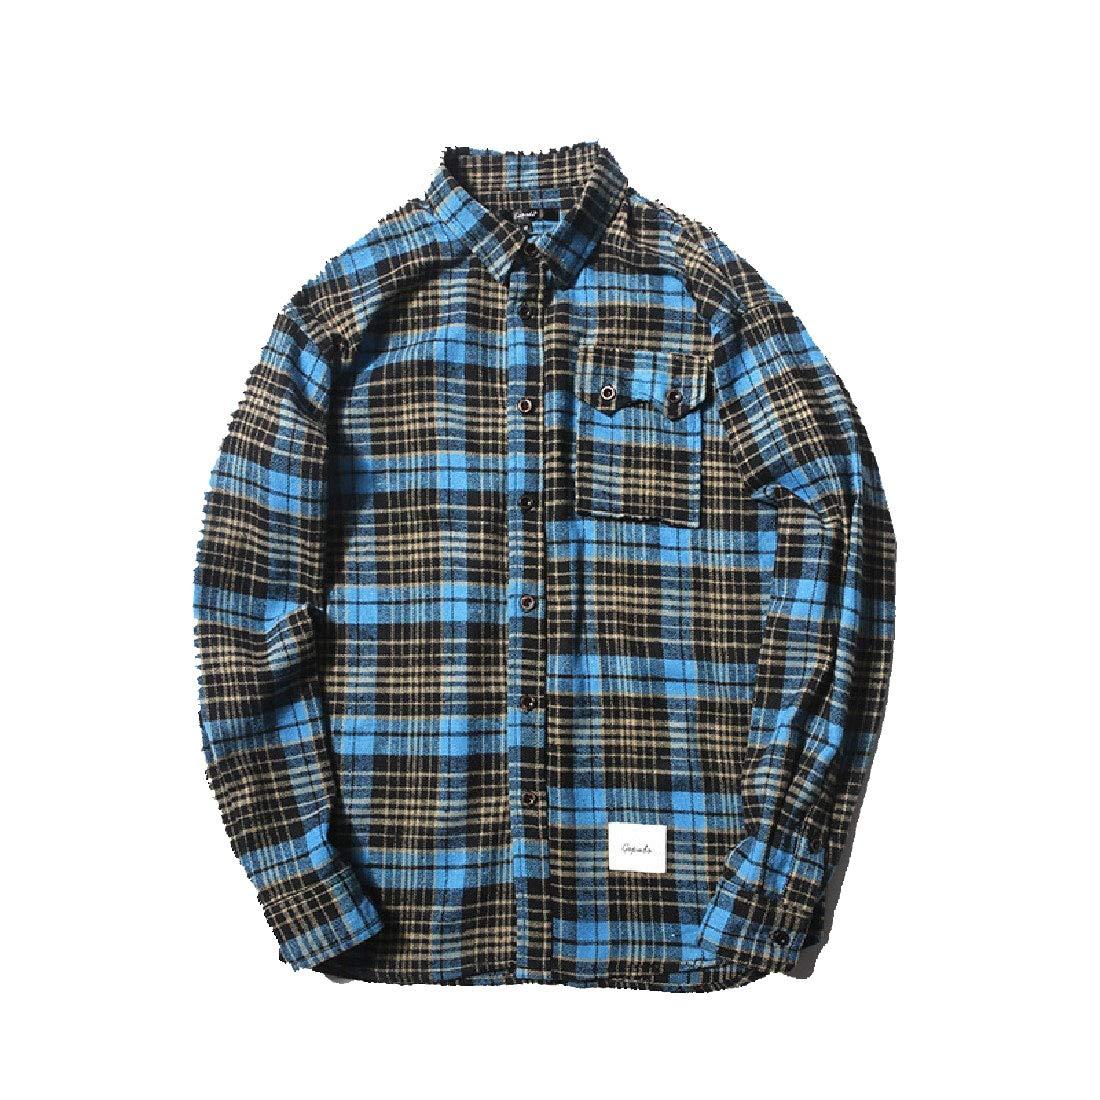 Winwinus Mens Cotton Classic Plaid Fall Fold-Collar Long-Sleeve Shirt